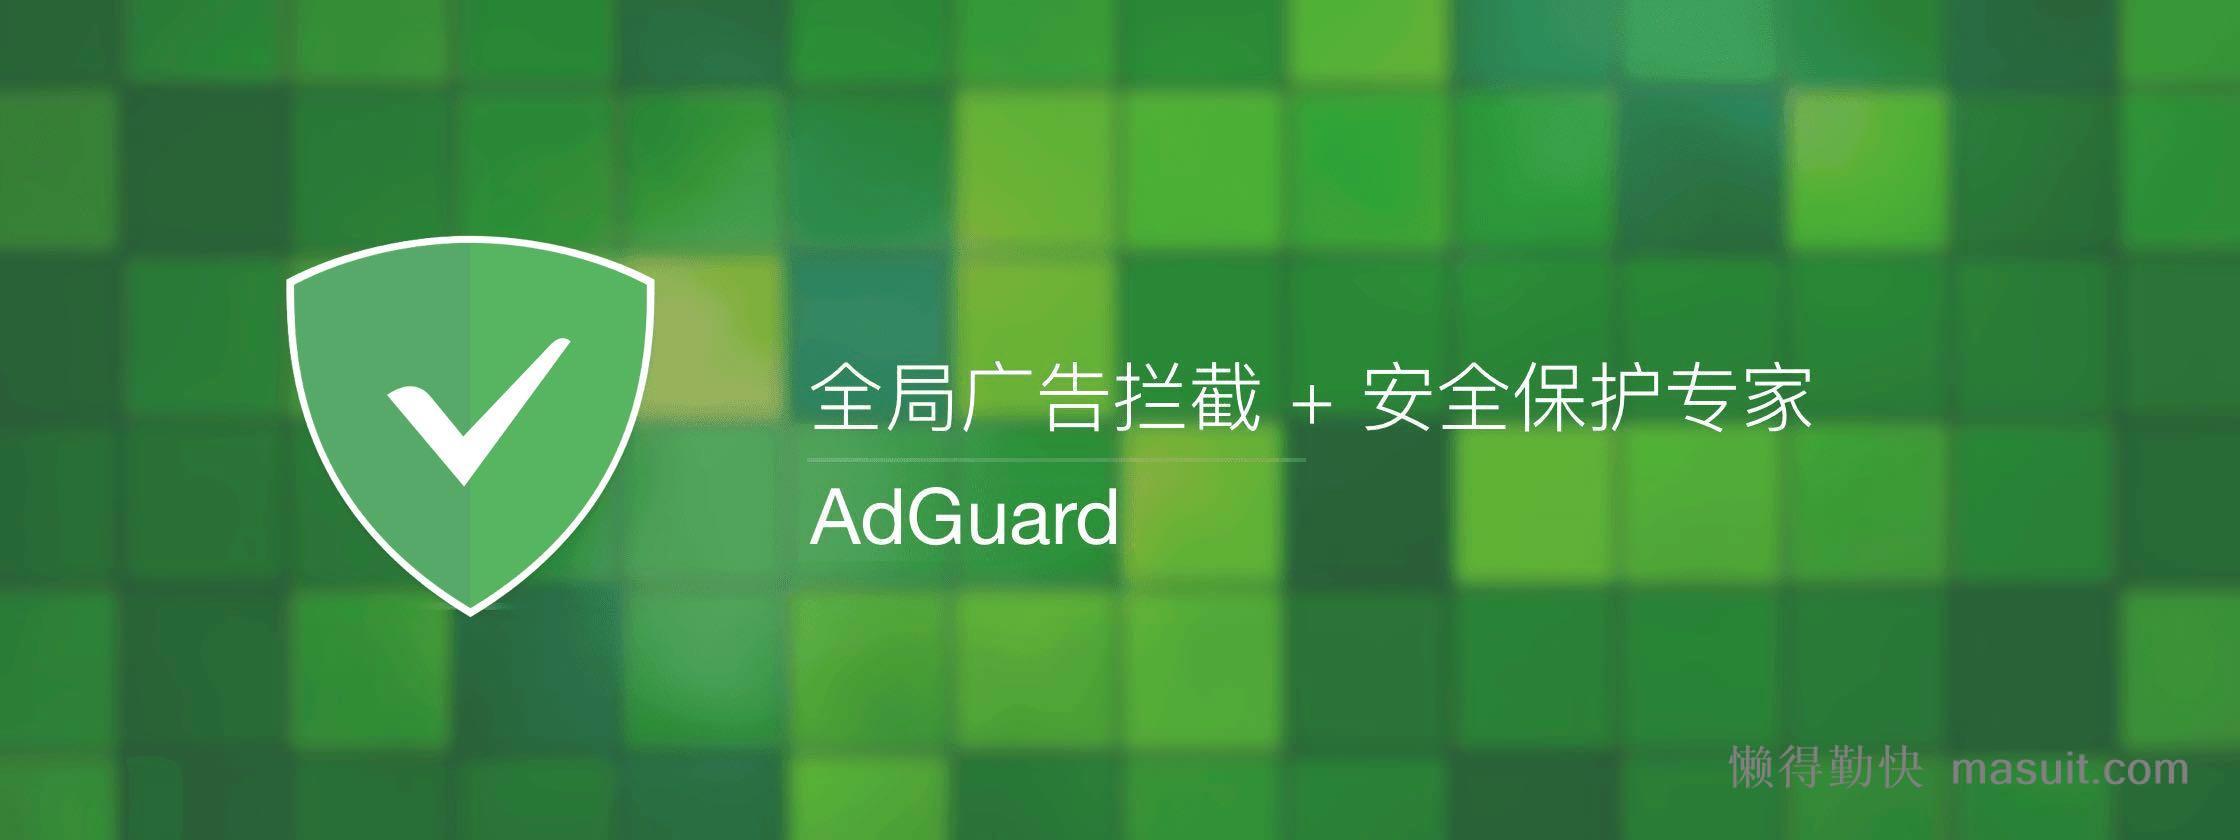 AdGuard 已是广告拦截领域的当红专家,能在电脑端与移动端 (iOS 与 Android) 提供超高质量的广告净化能力,同时操作简单。现逢 10 周年优惠,最低 20 元/半年,领券还可优惠。新用户首单还能立减5元!